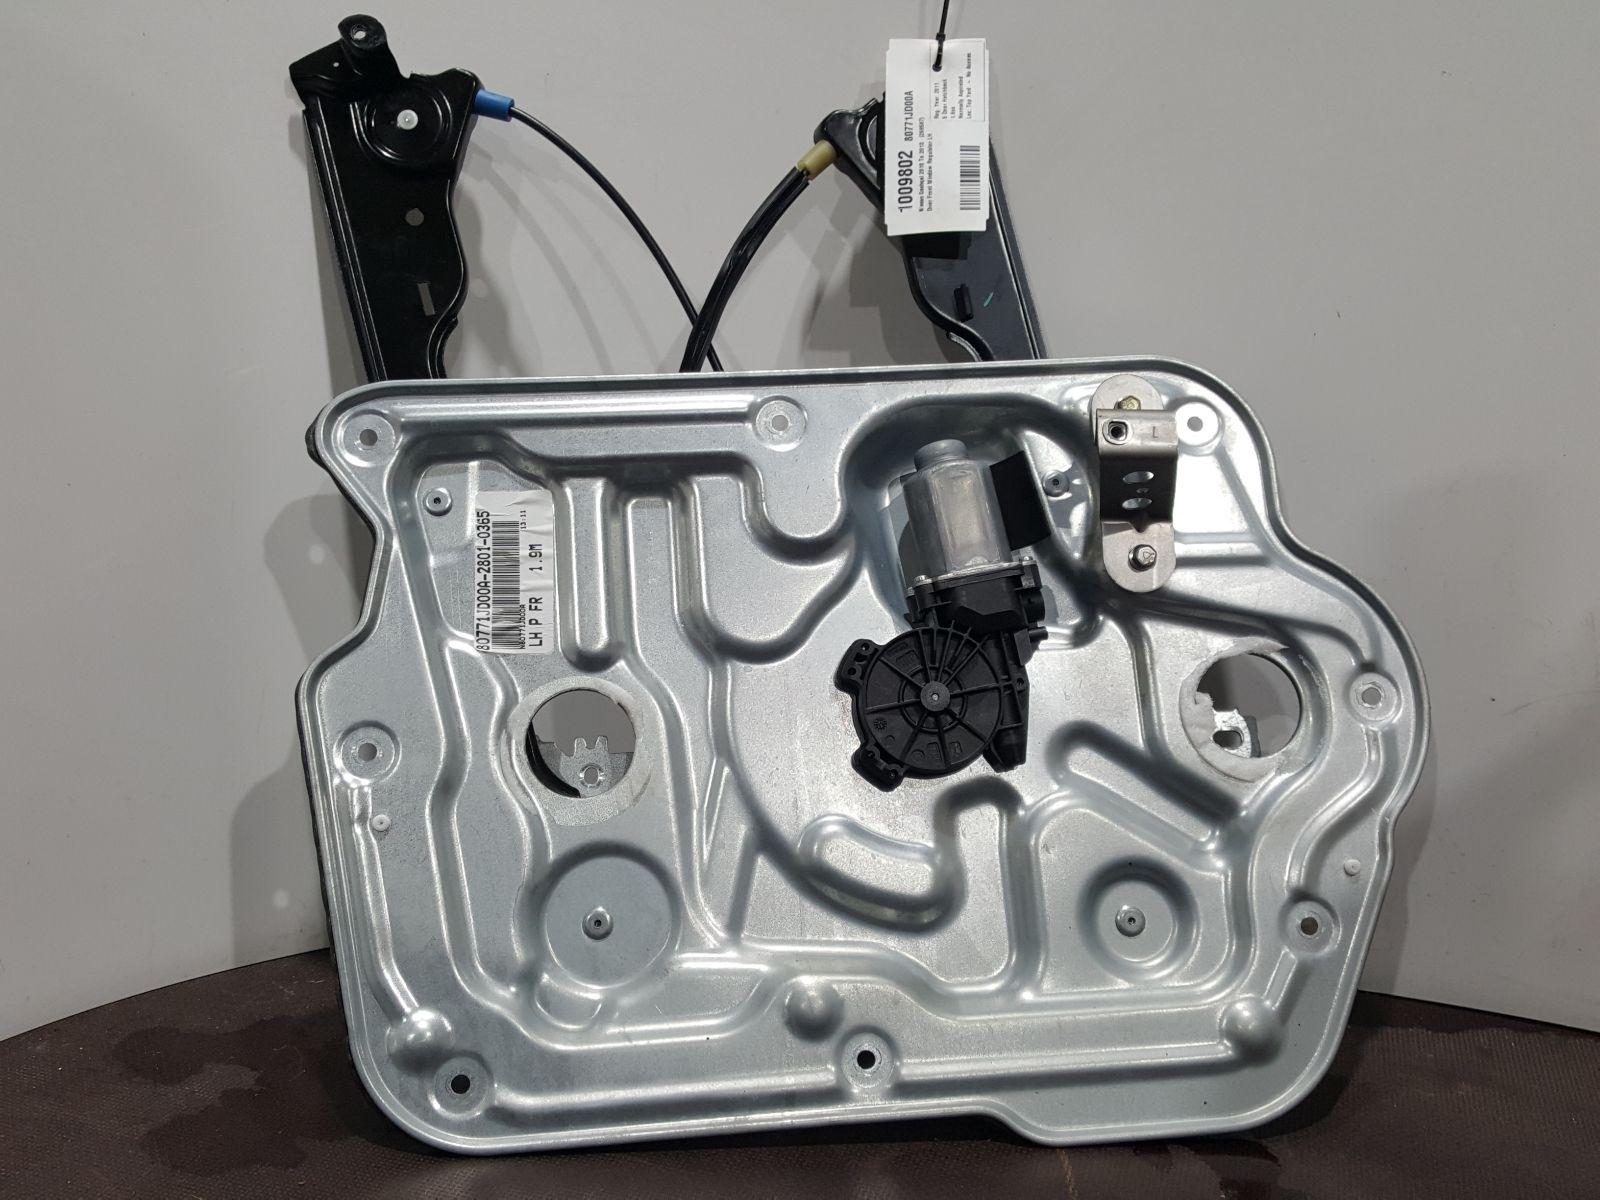 2010 Nissan Sentra Wiring Diagrams Additionally Nissan Versa Parts